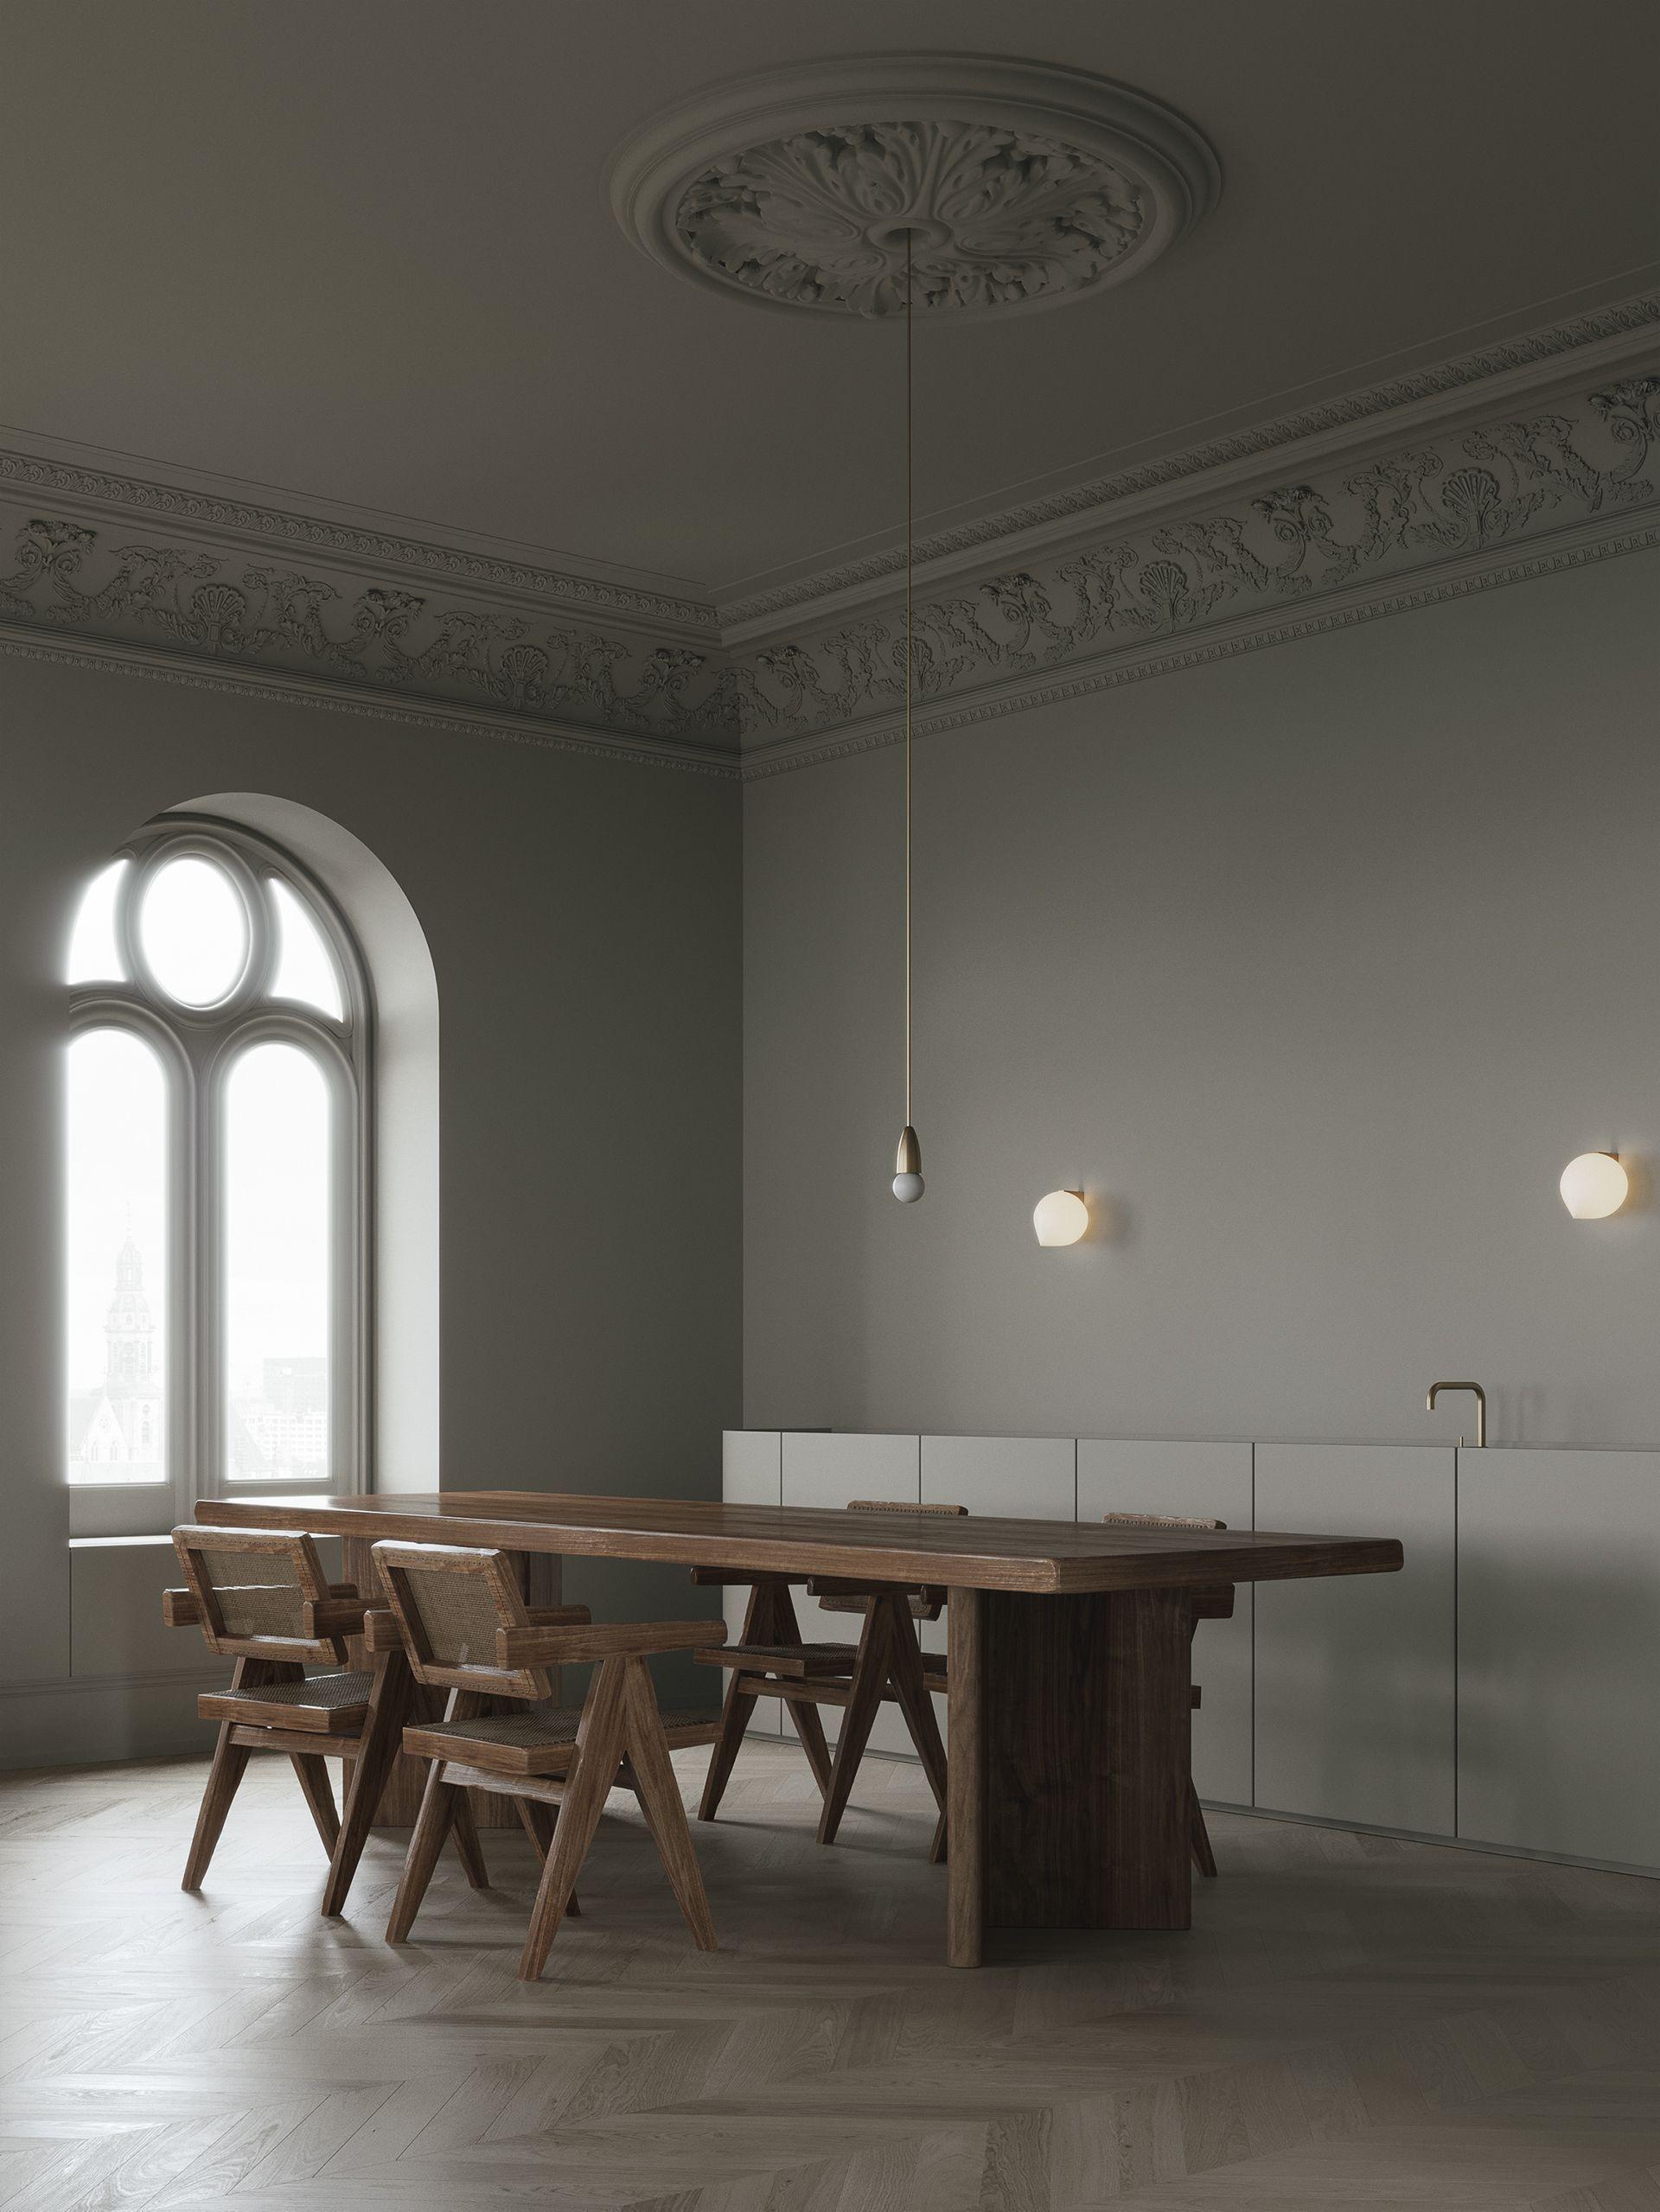 E78cf4b095728d57363a58f8442543b6 Design Inredning Interiorer Ideer For Heminredning